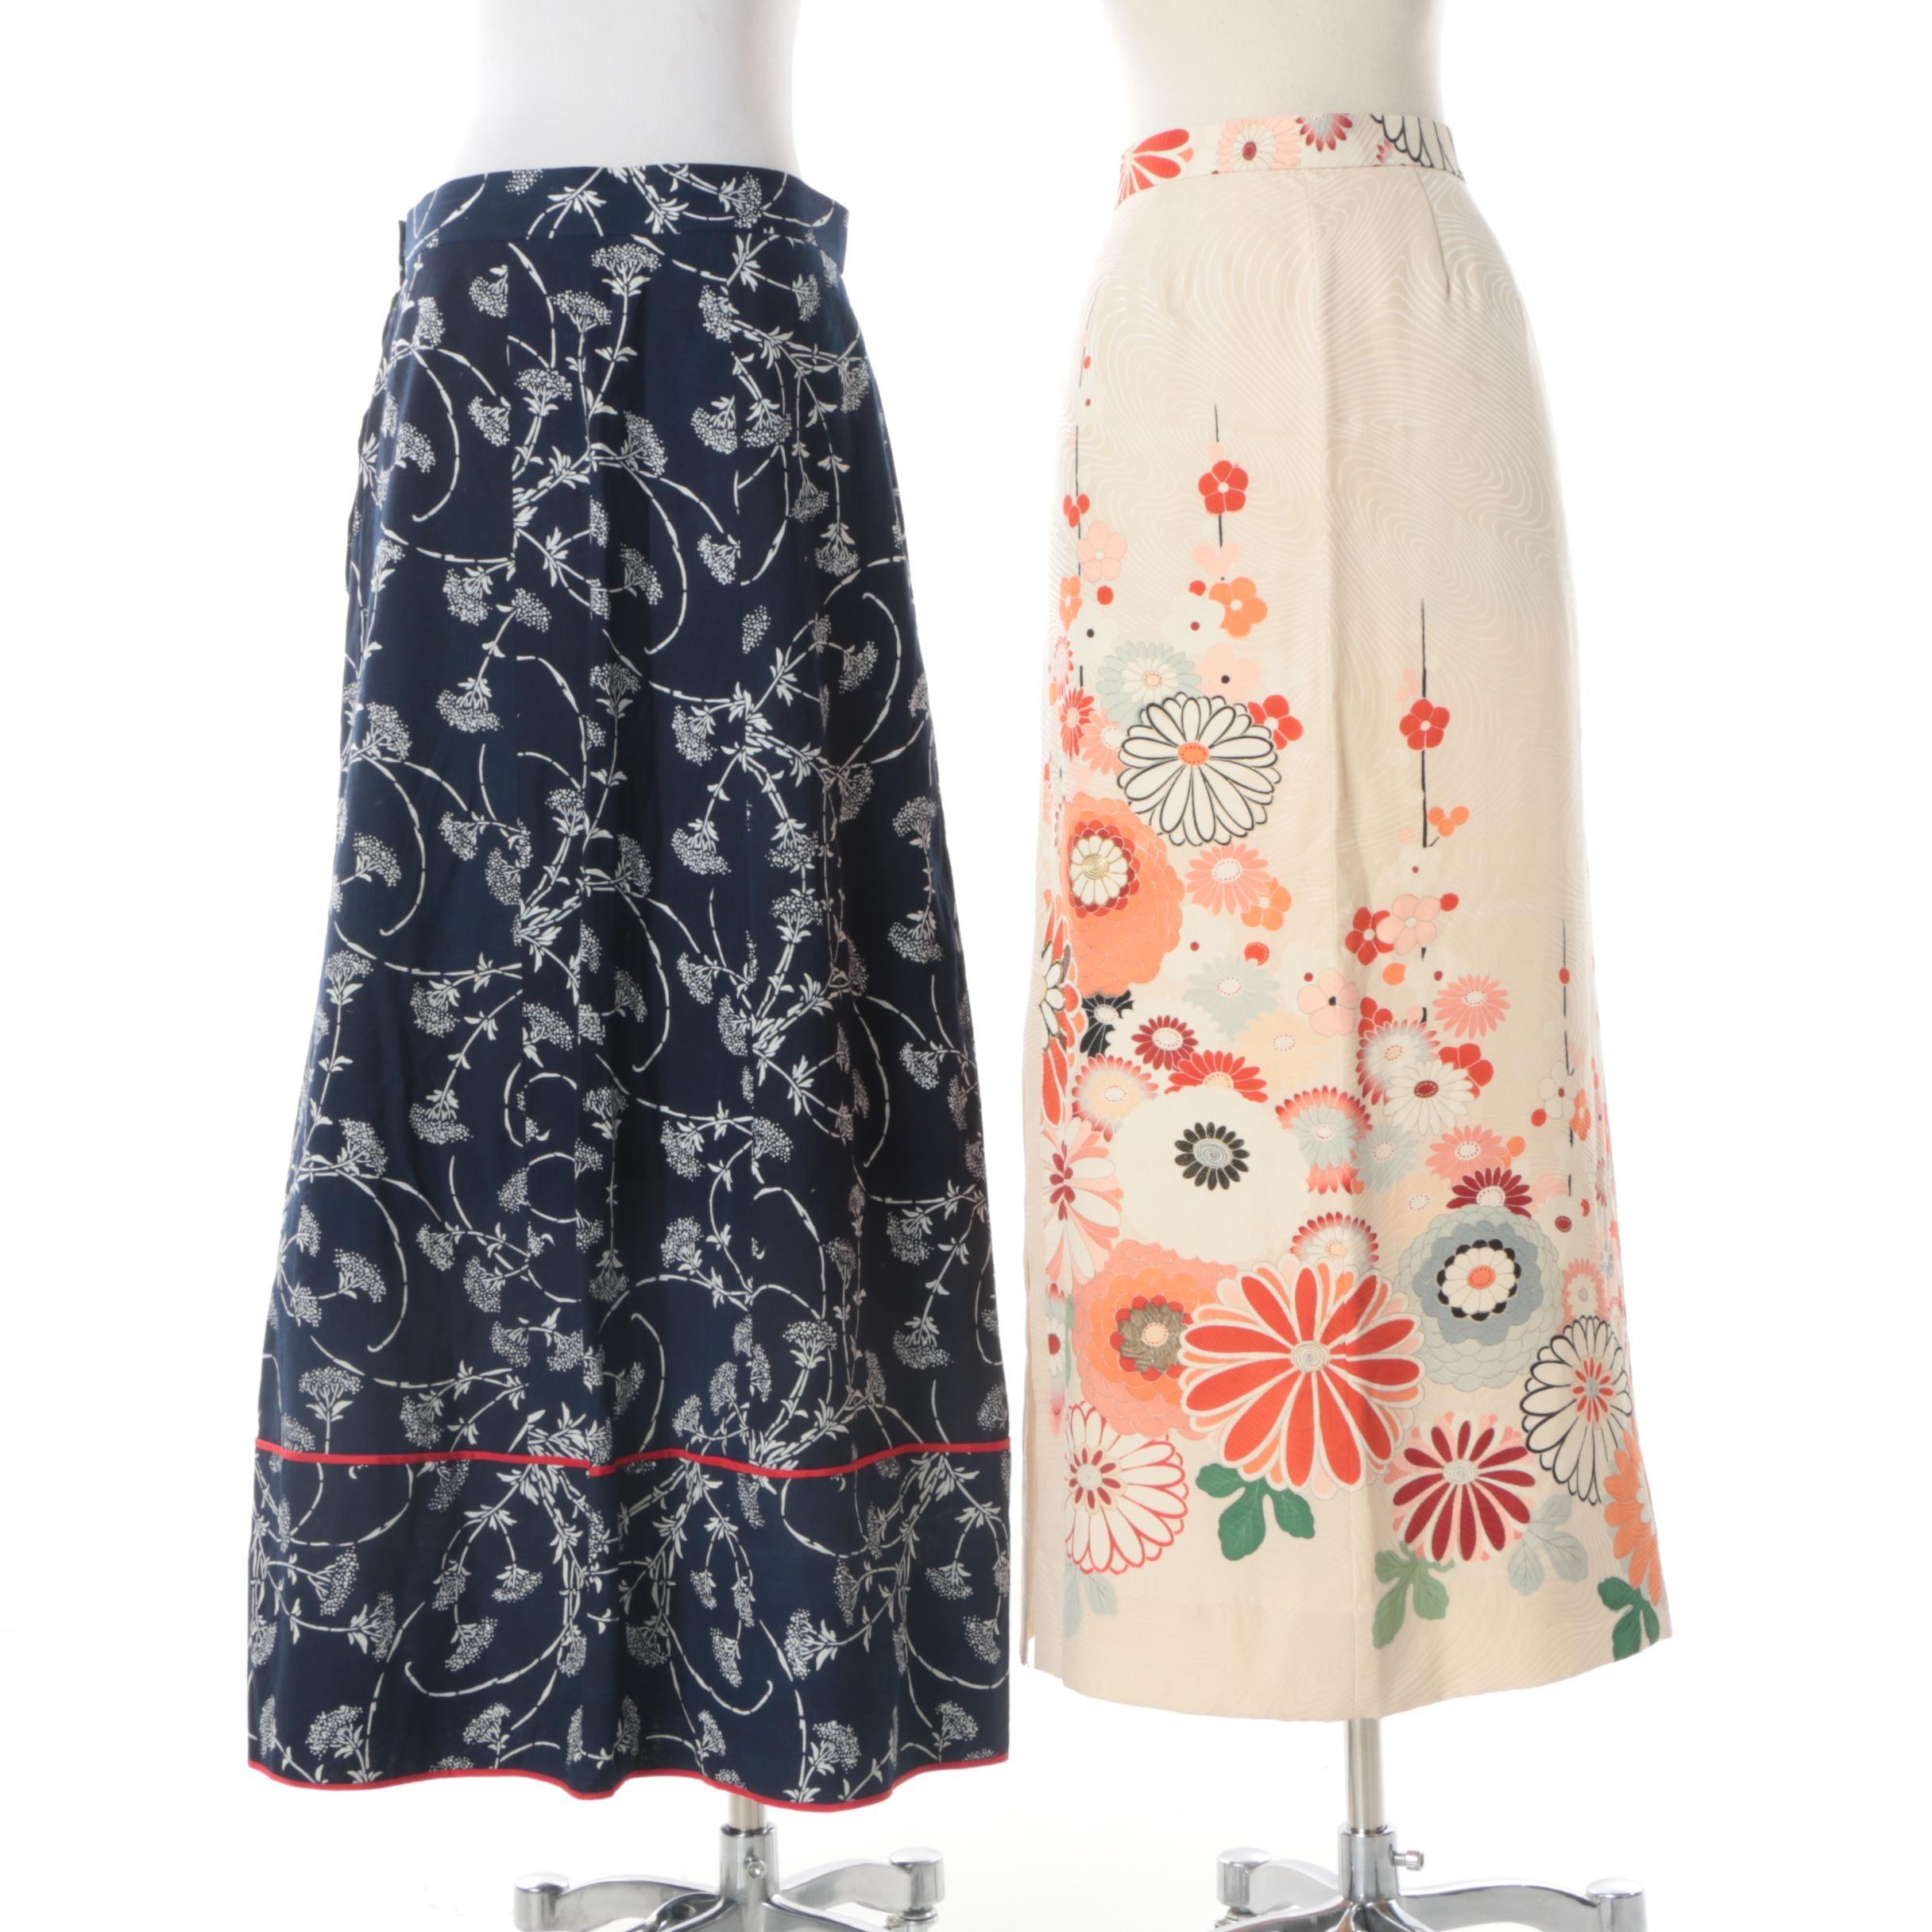 Women's Circa 1970s Vintage Floral Print Maxi Skirts Including Tomoyo